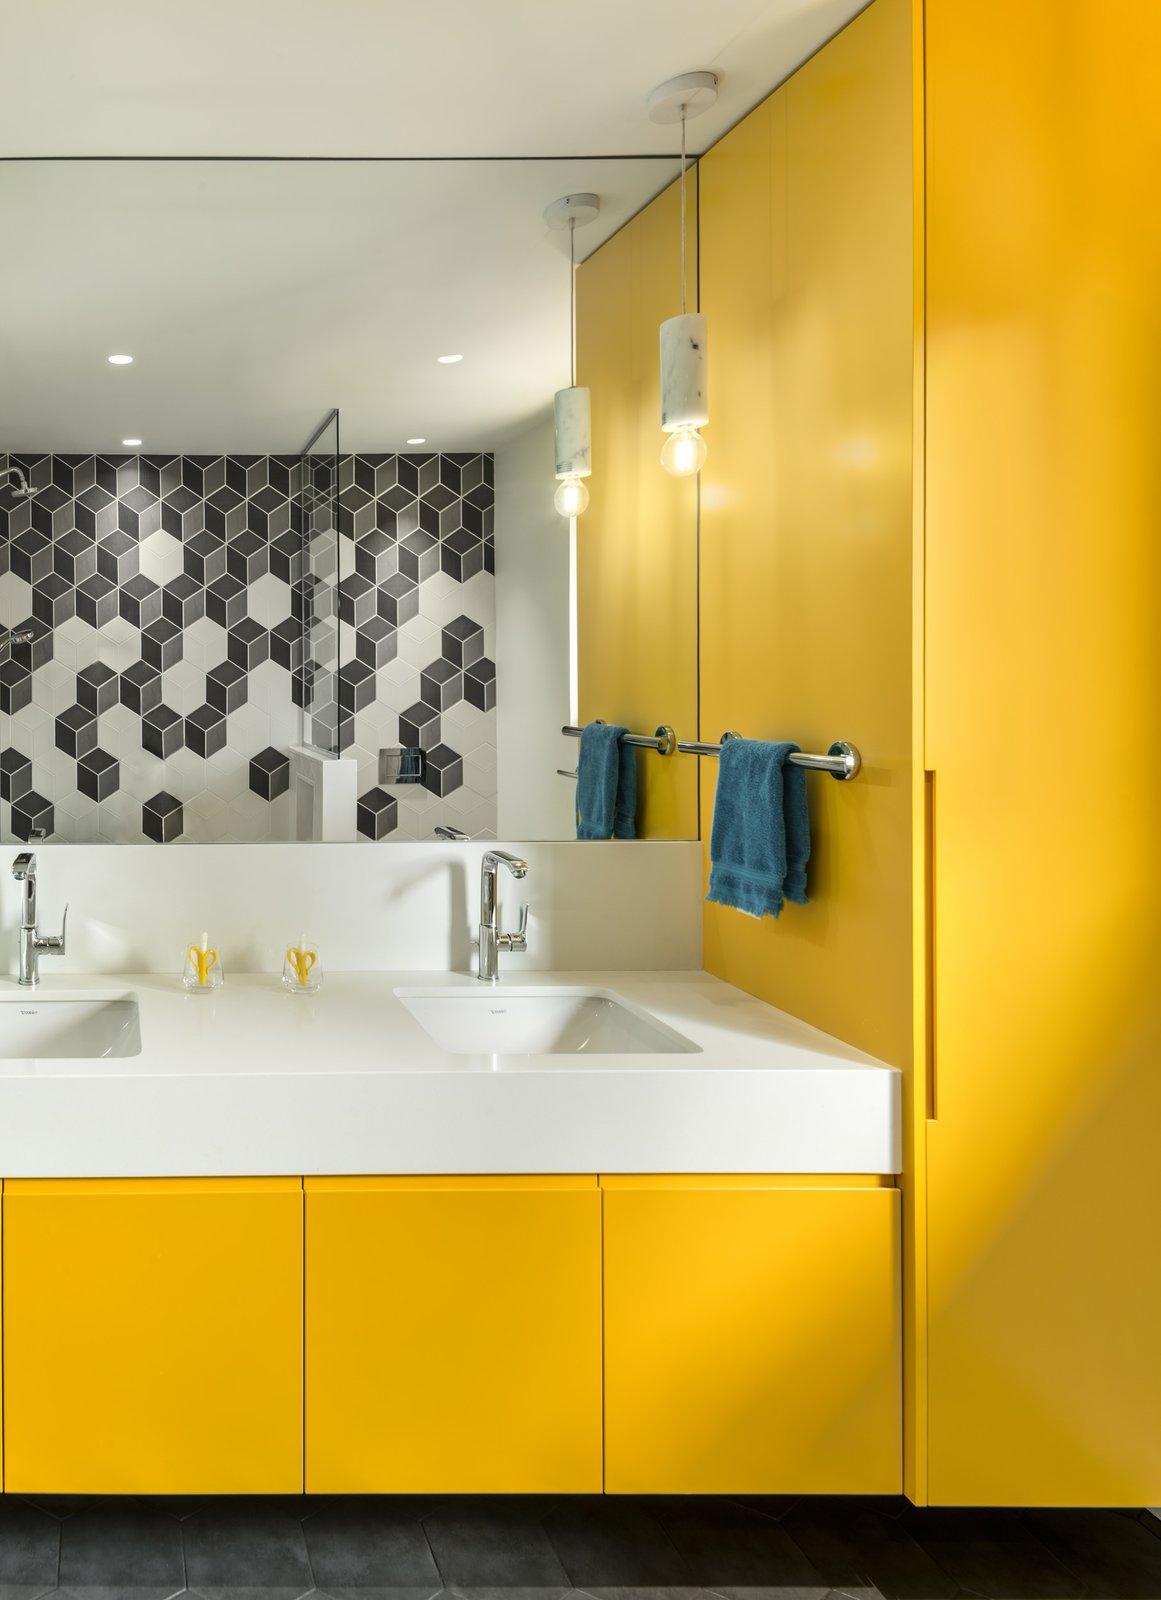 Bath, Recessed, Engineered Quartz, Ceiling, Pendant, Undermount, Porcelain Tile, Open, and Porcelain Tile Boys Bathroom  Best Bath Undermount Pendant Porcelain Tile Photos from The Rockcliffe Renovation